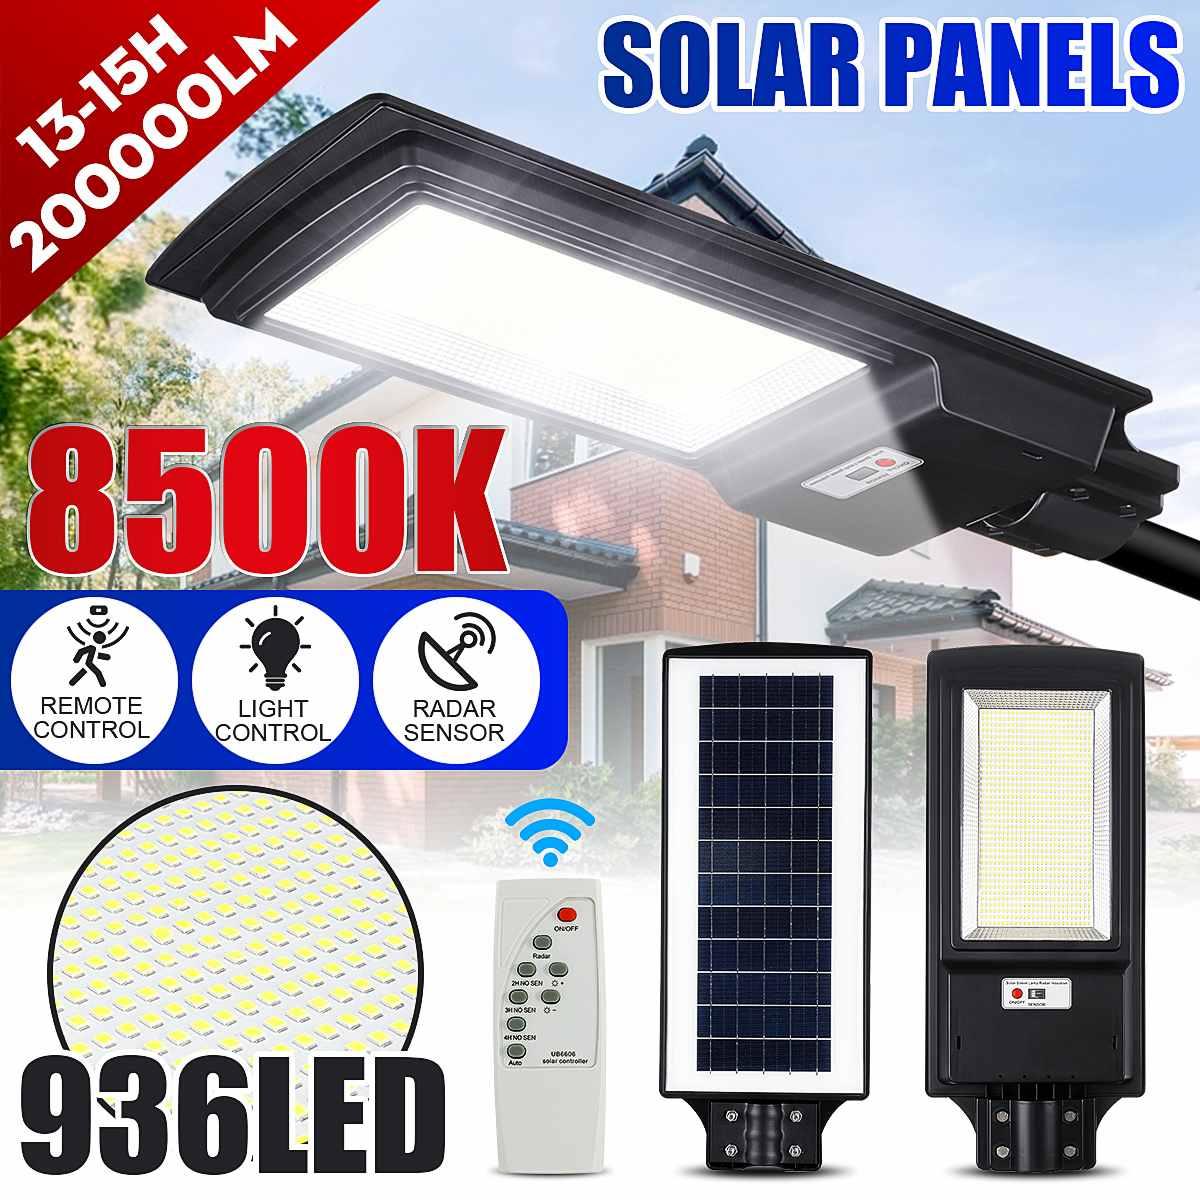 150W 300W LED Solar Straße Licht 2835smd Radar Sensor Super Helle 436led/936led Solar Lampe für Plaza und Pathway 5000-6000K